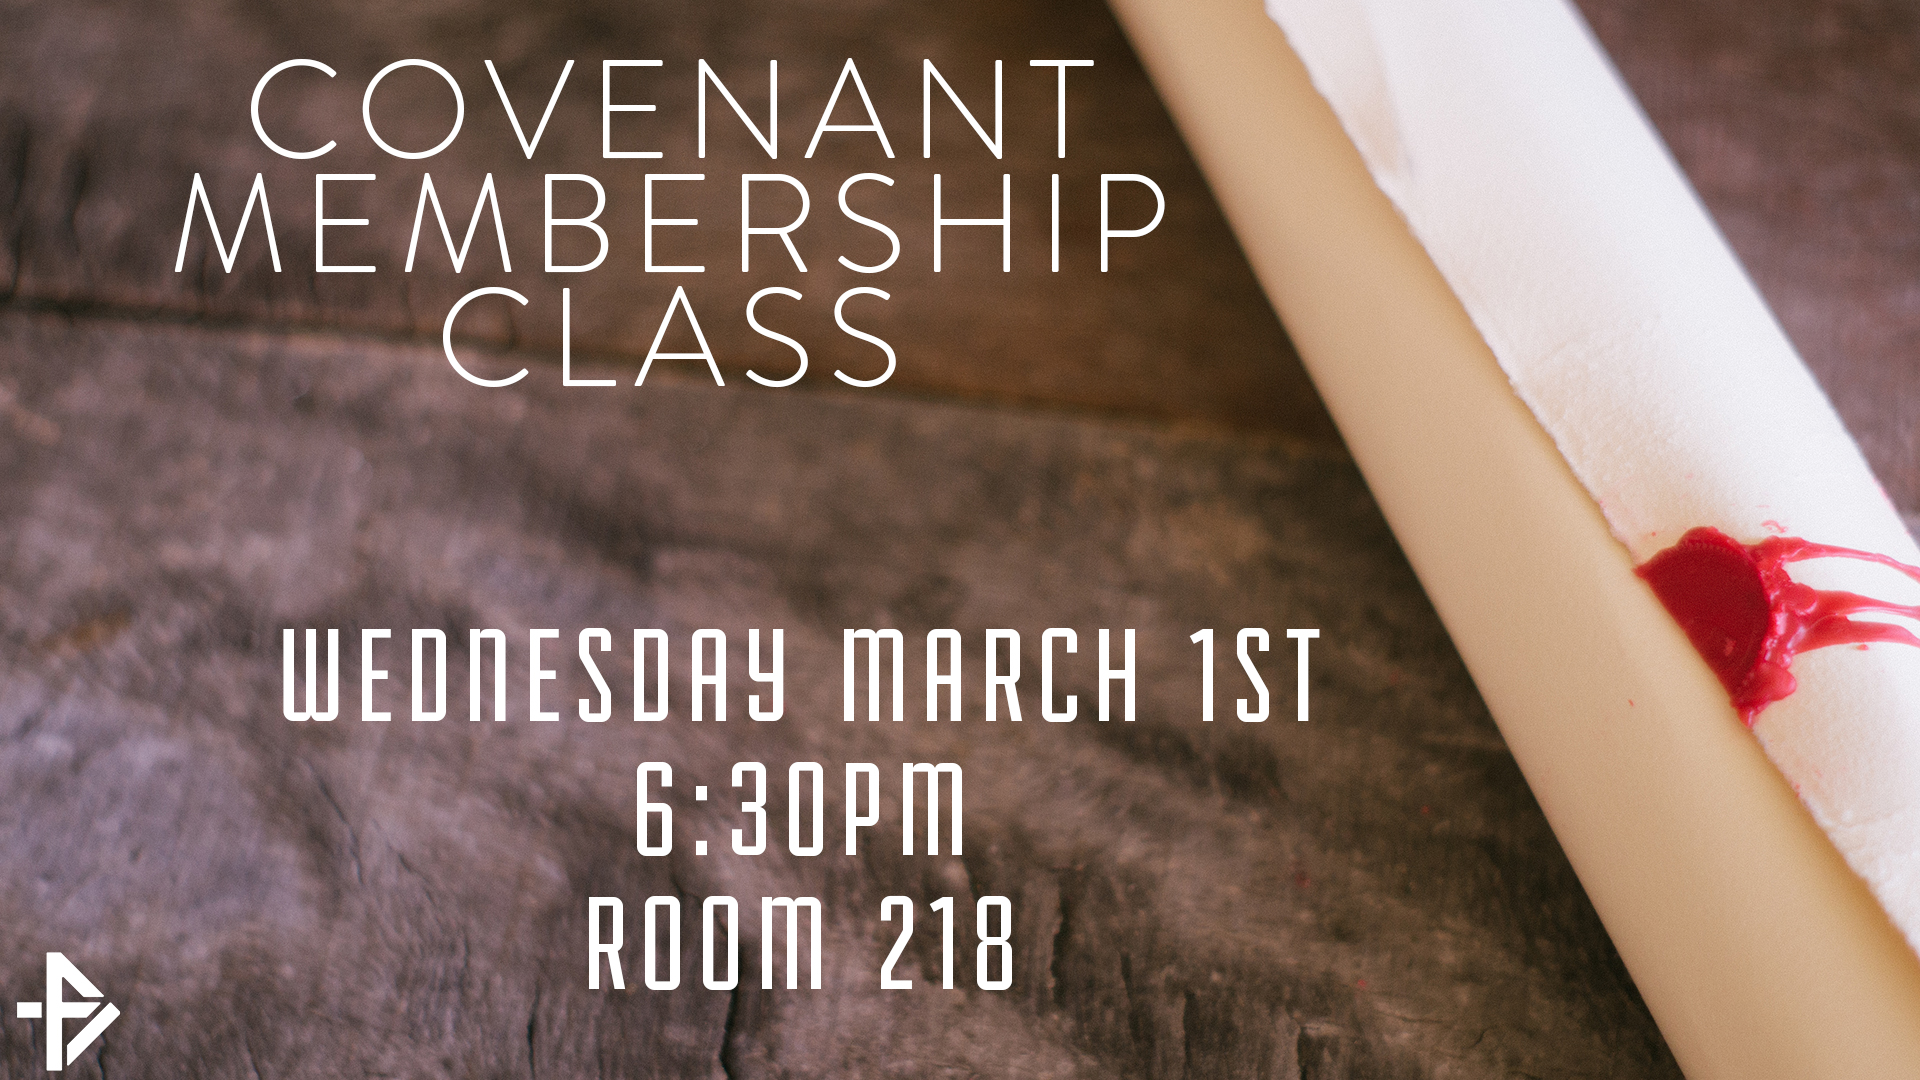 Covenant membership class march titlesplash